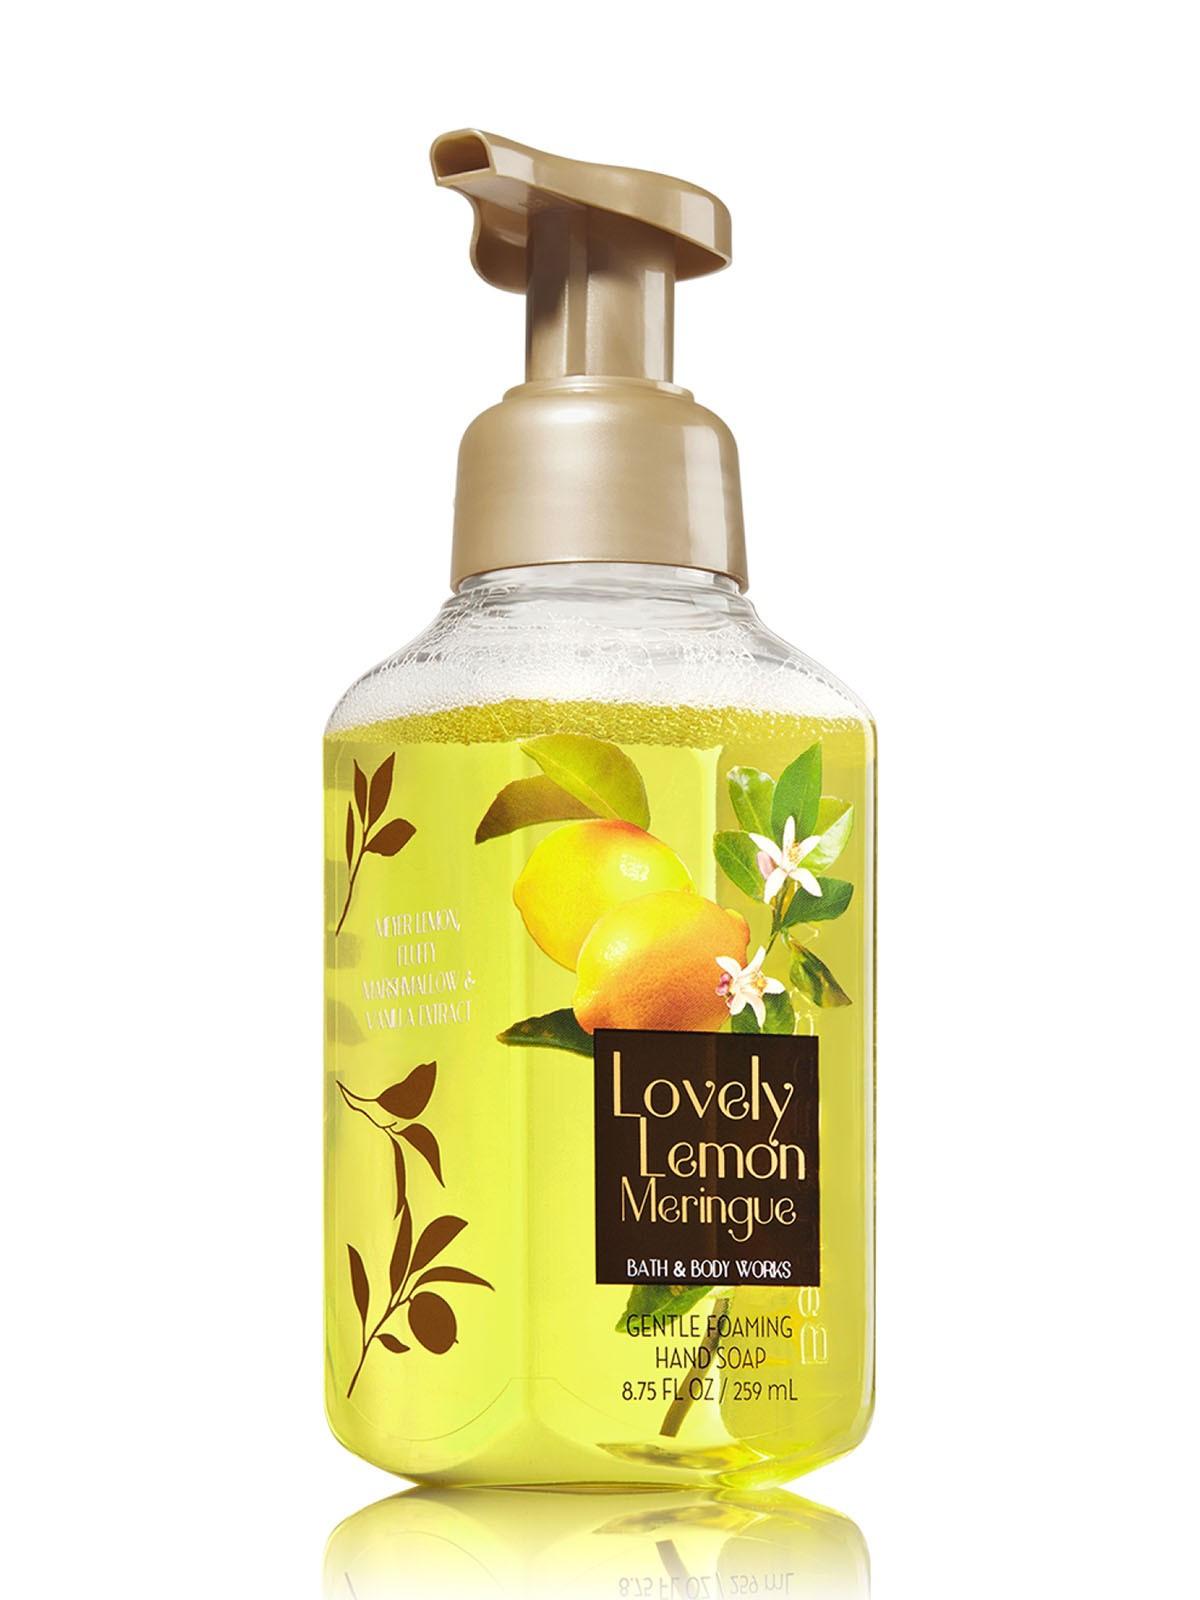 Sabonete Espuma de sabão Anti-Bacterial Gentle Foaming Hand Soap Bath & Body Works Lovely Lemon Meringue